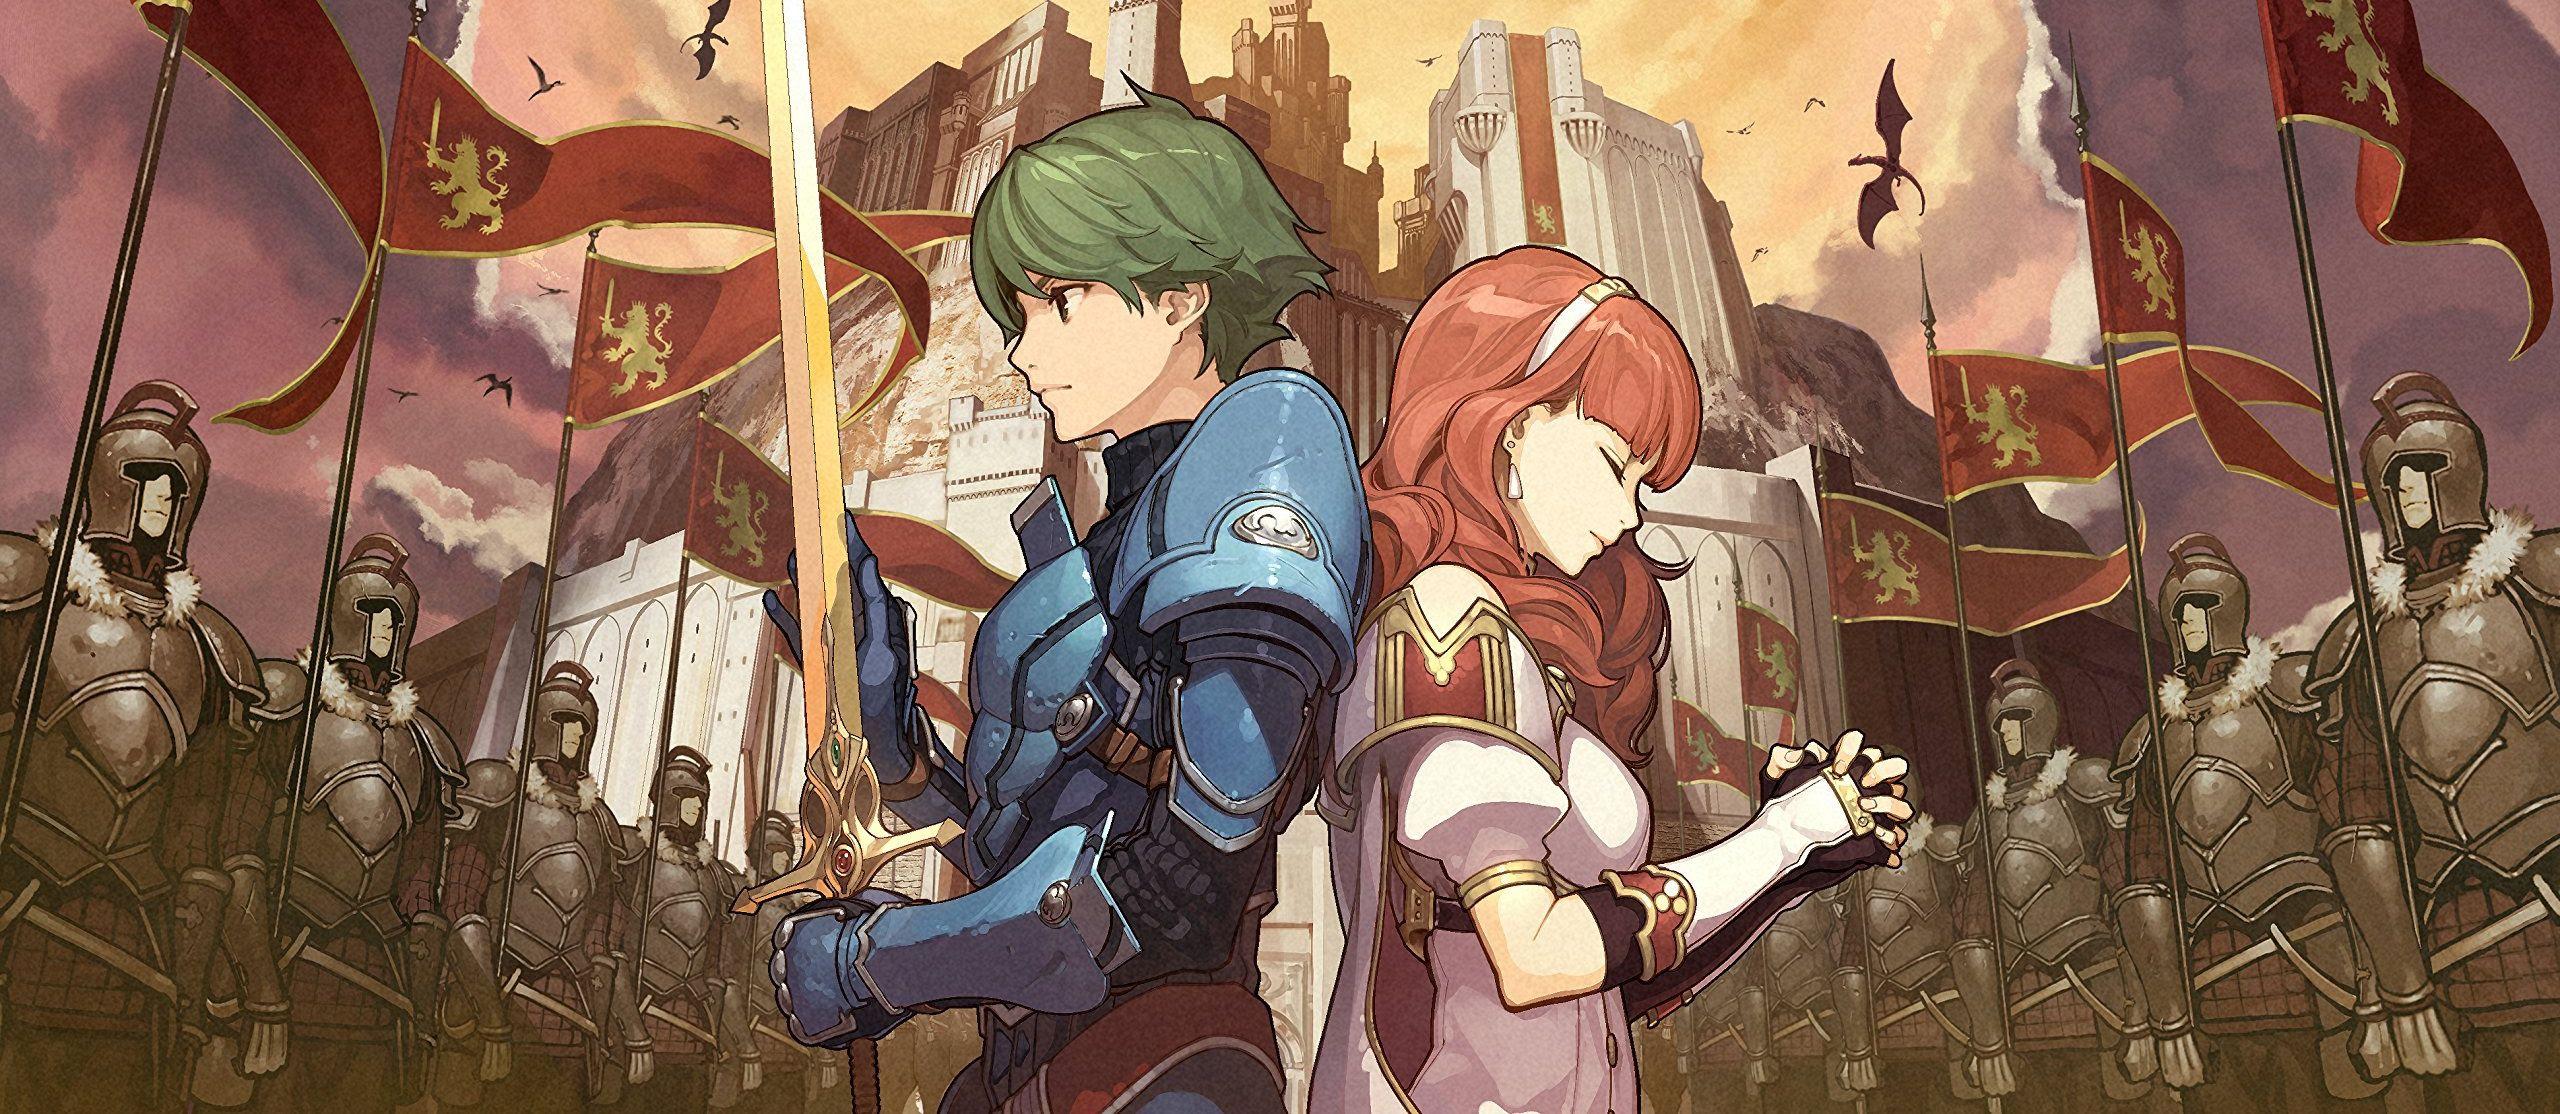 Fire Emblem Echoes: Shadows of Valentia storms Japan screenshot